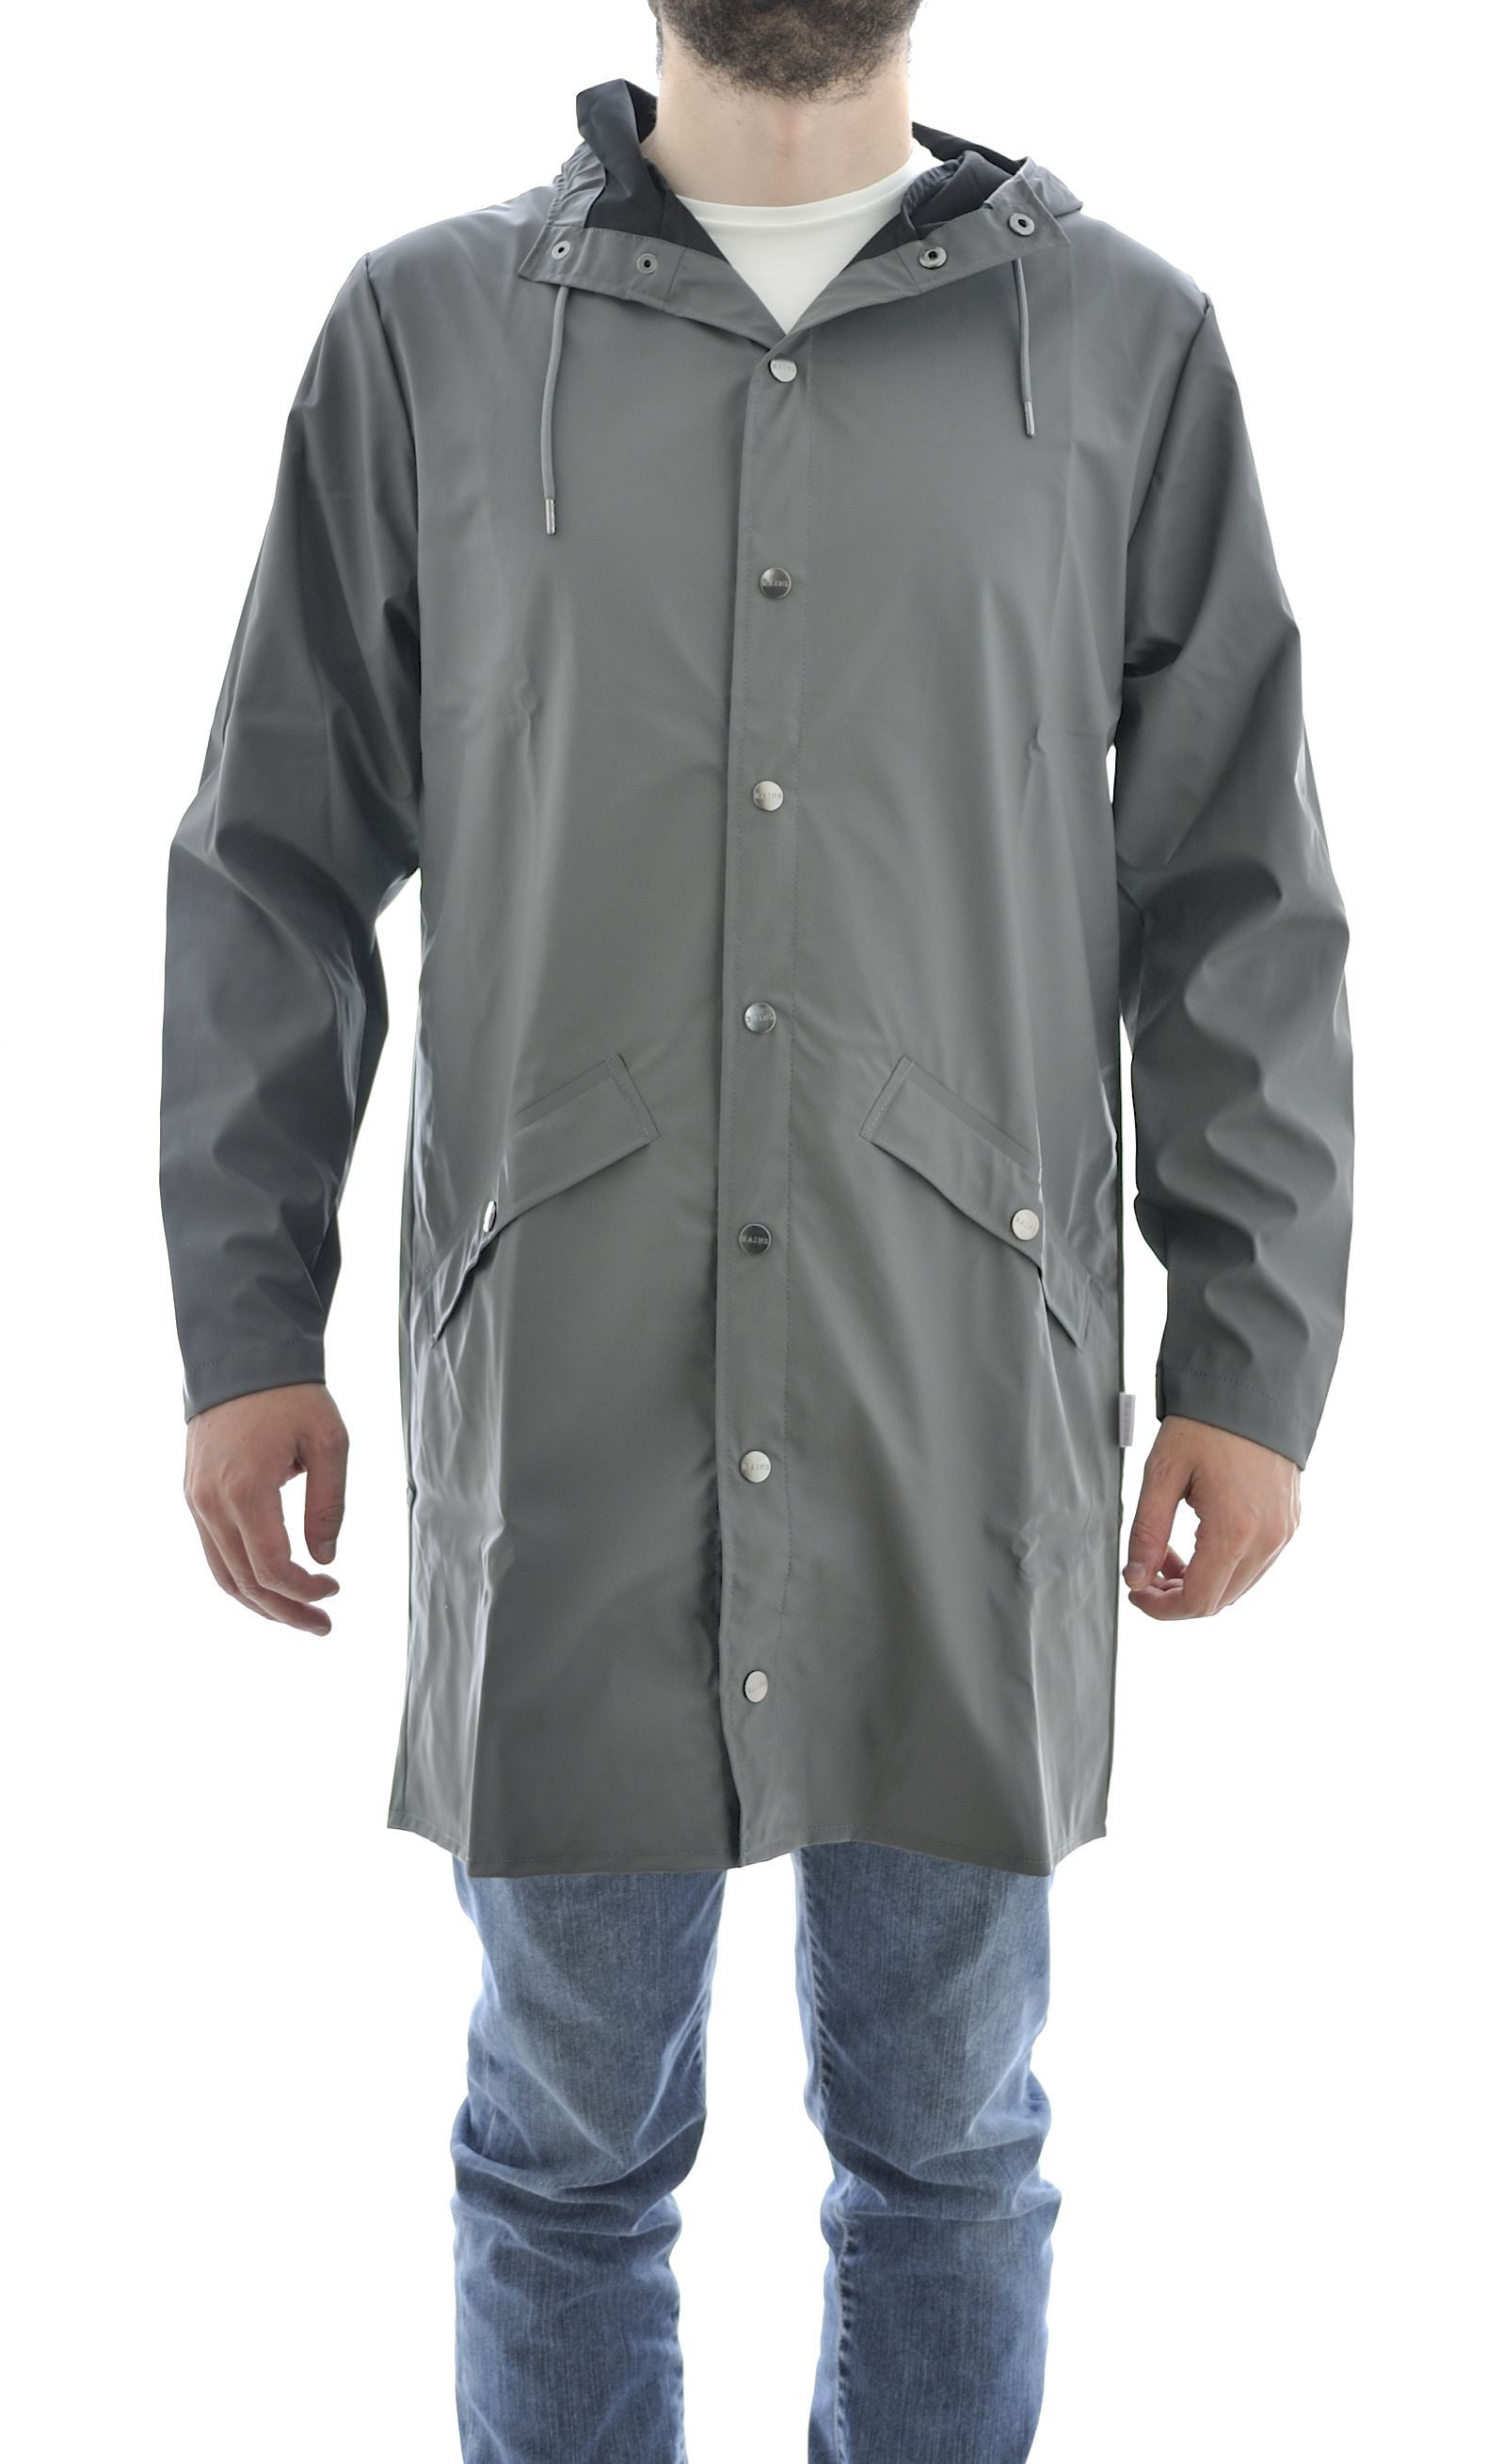 Picture of Long Jacket, rainproof, unisex, grey